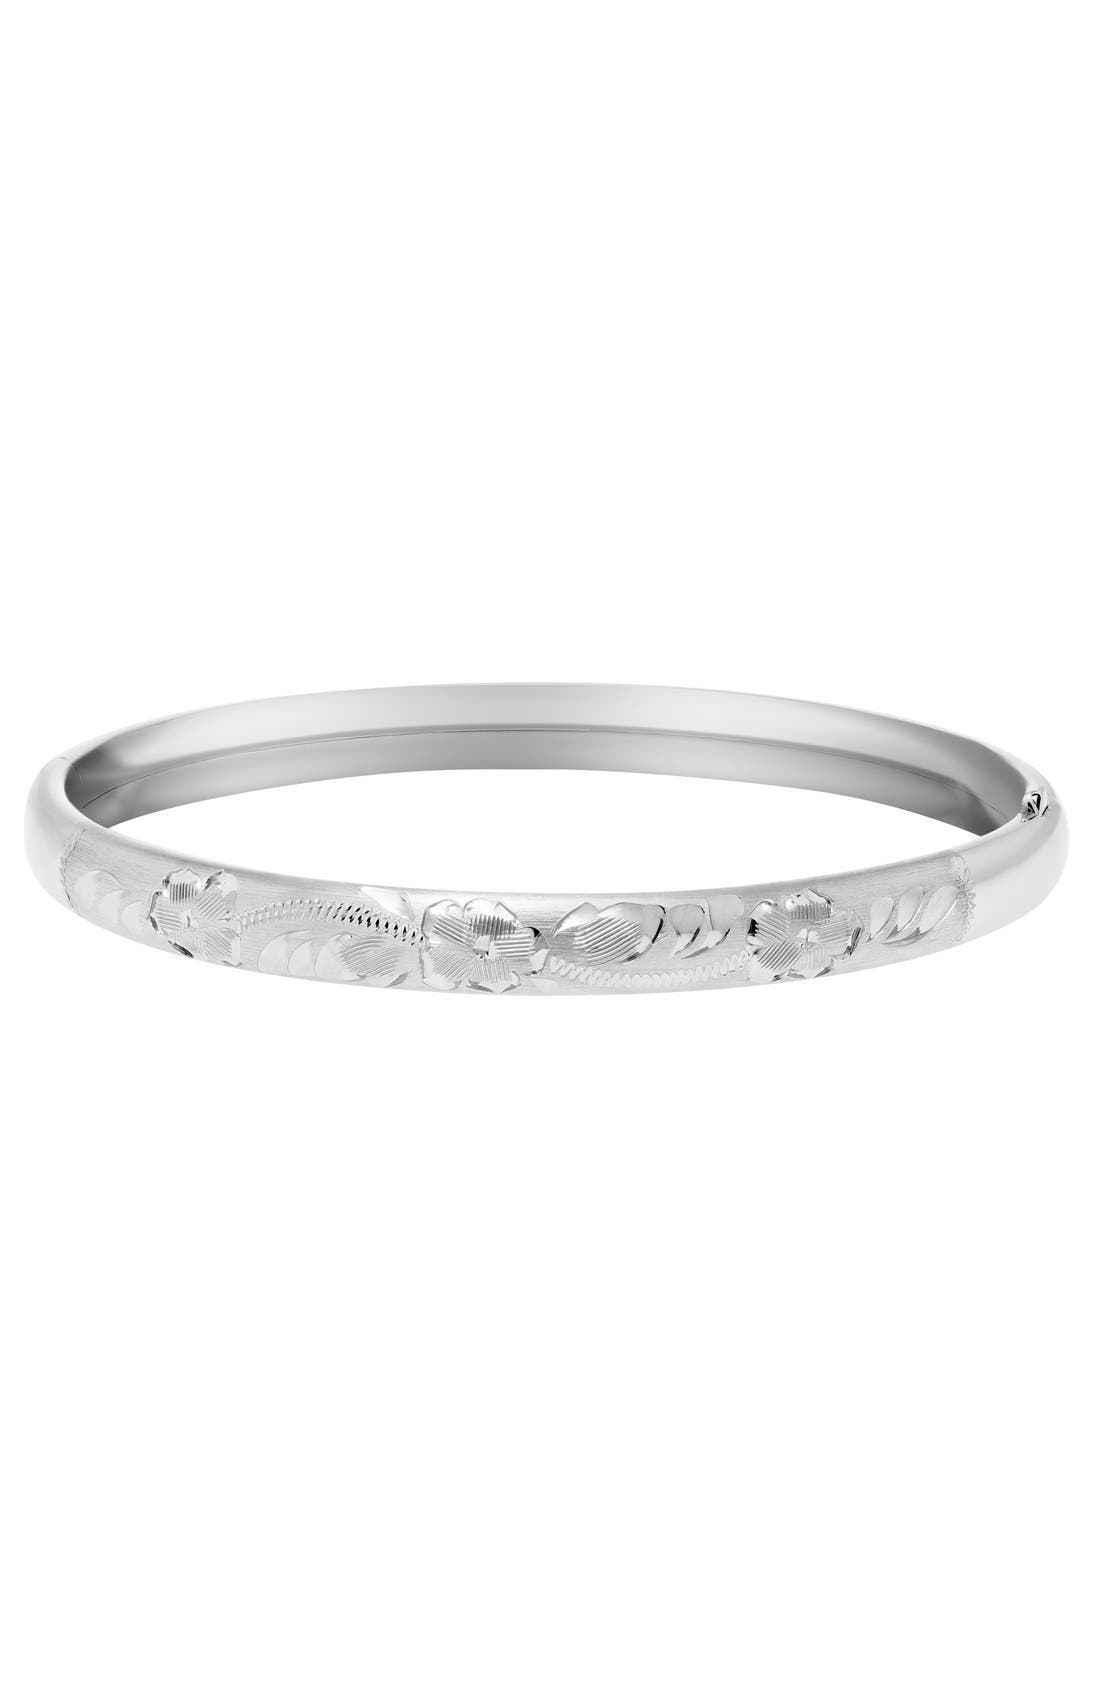 MIGNONETTE Sterling Silver Bracelet